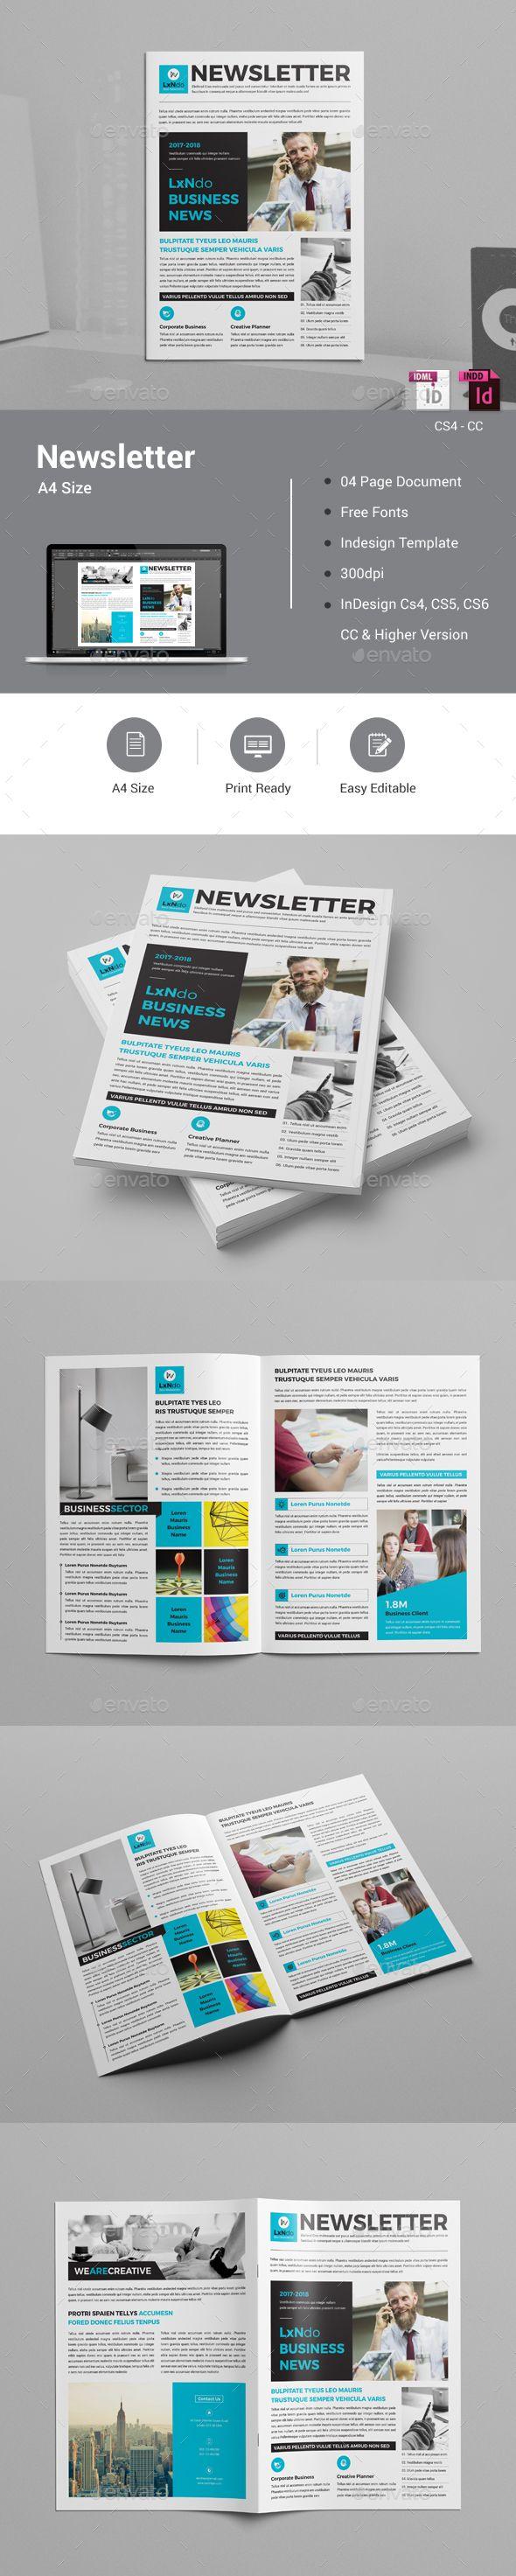 Newsletter Design Template Indesign Indd Newsletter Template